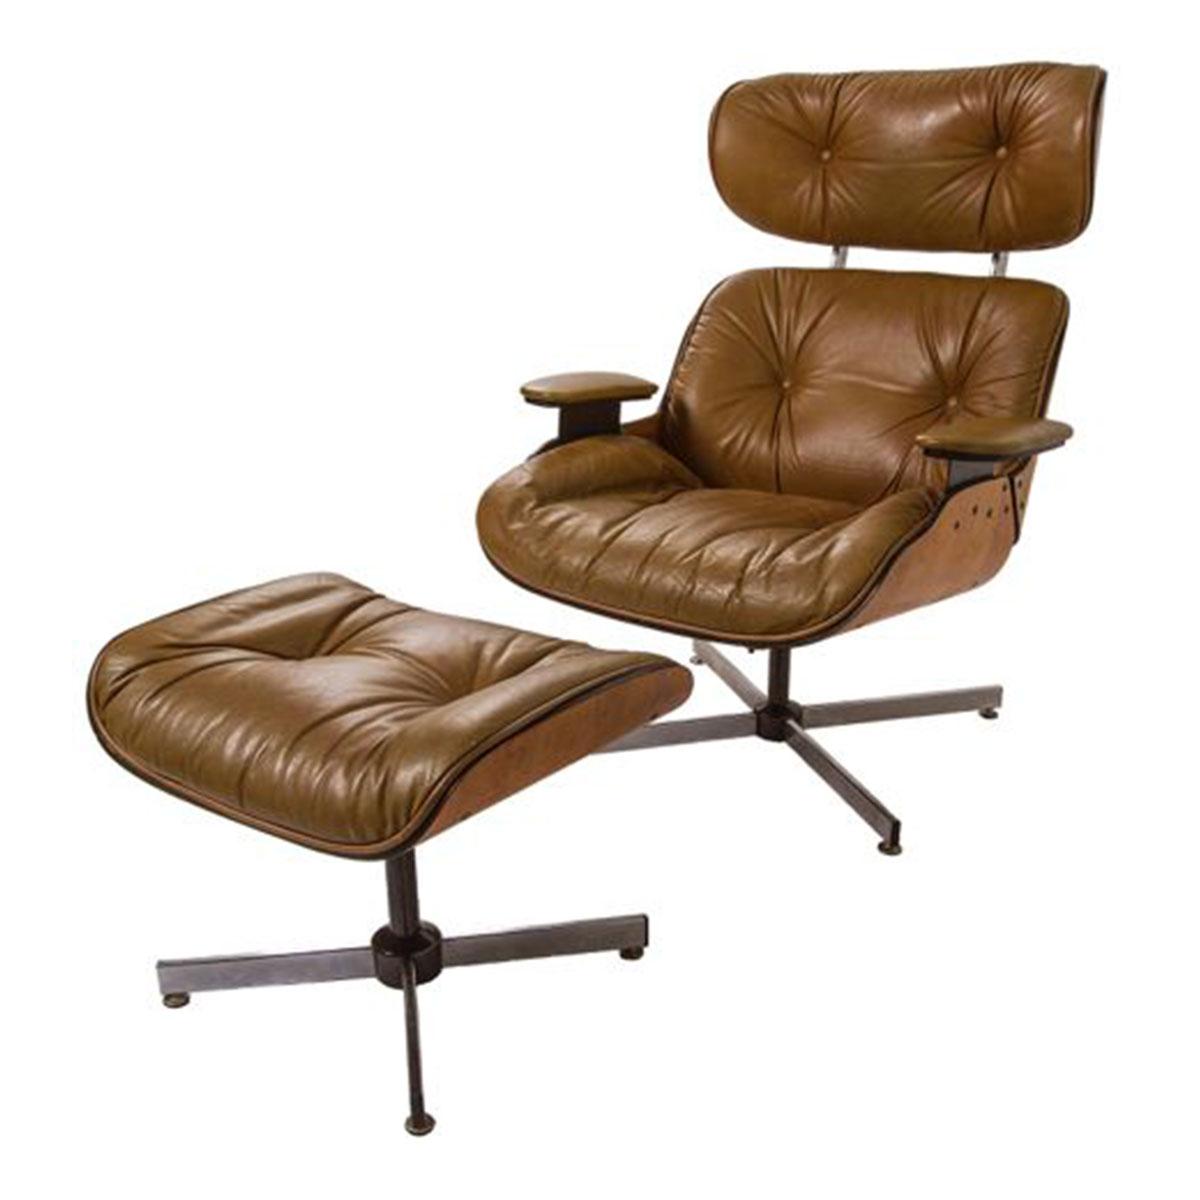 Grand Ottoman Mobler Ottoman Style Furniture Mid Century Eames Style Chair furniture Ottoman Style Chair